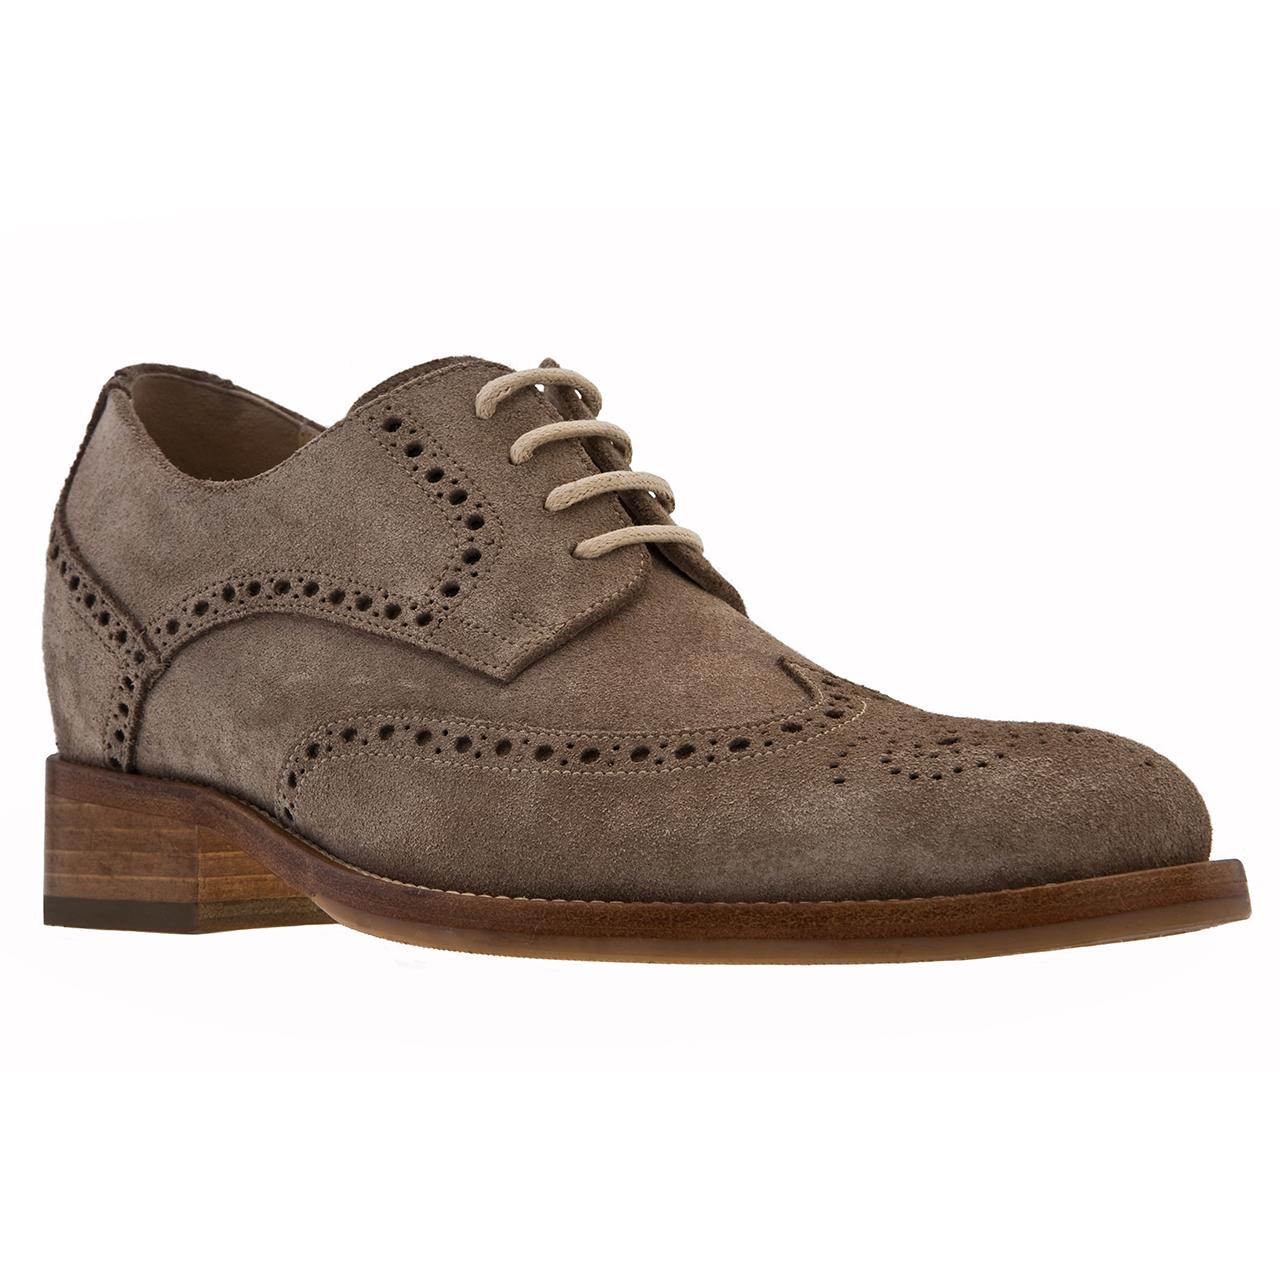 Argentina - Elevator Dress Shoes GuidoMaggi e8204aa843f